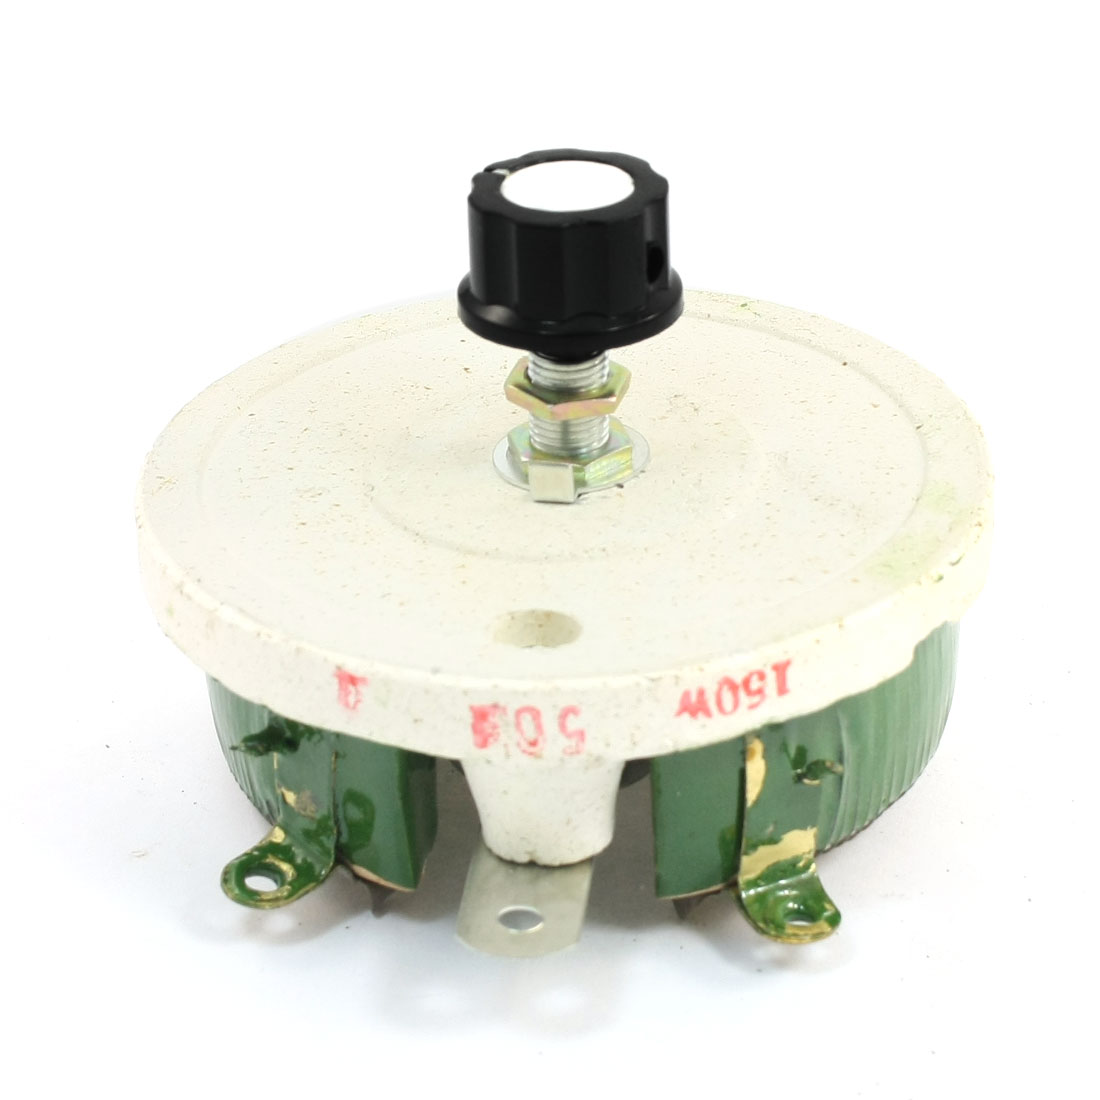 150W 50ohm Ceramic Wirewound Potentiometer Taper Pot Resistor Rheostat